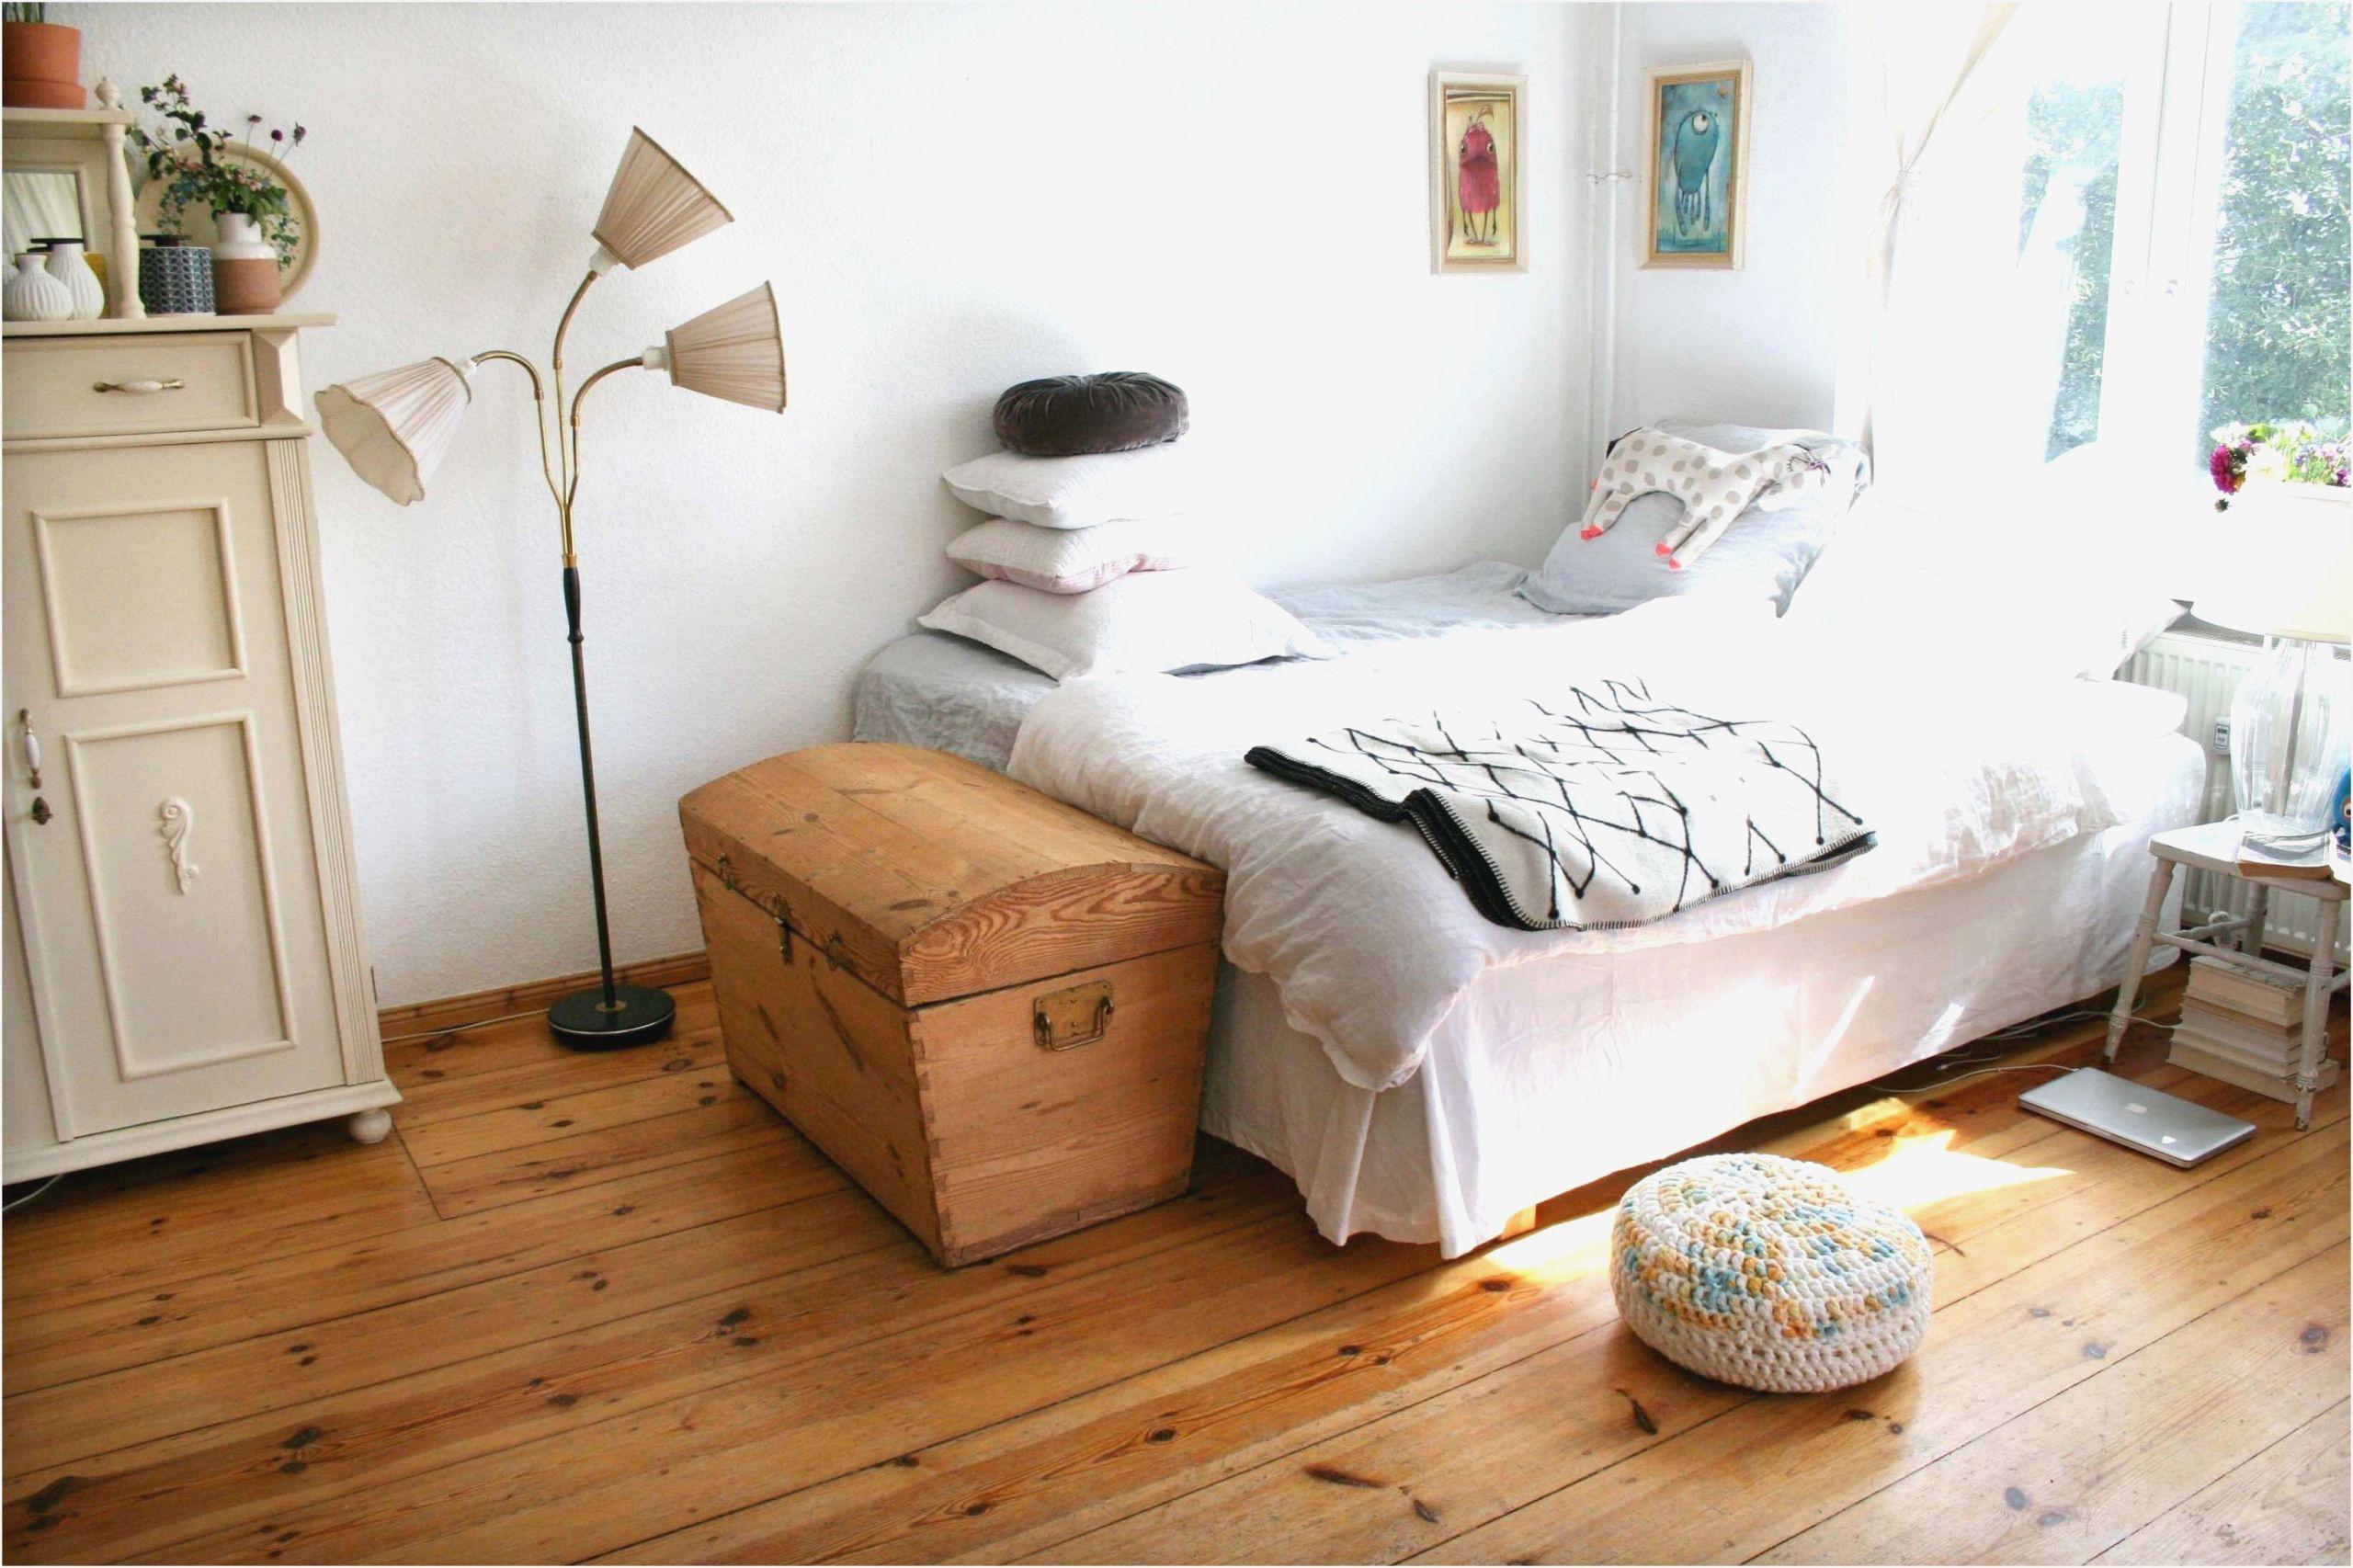 romantische deko ideen schlafzimmer of romantische deko ideen schlafzimmer scaled